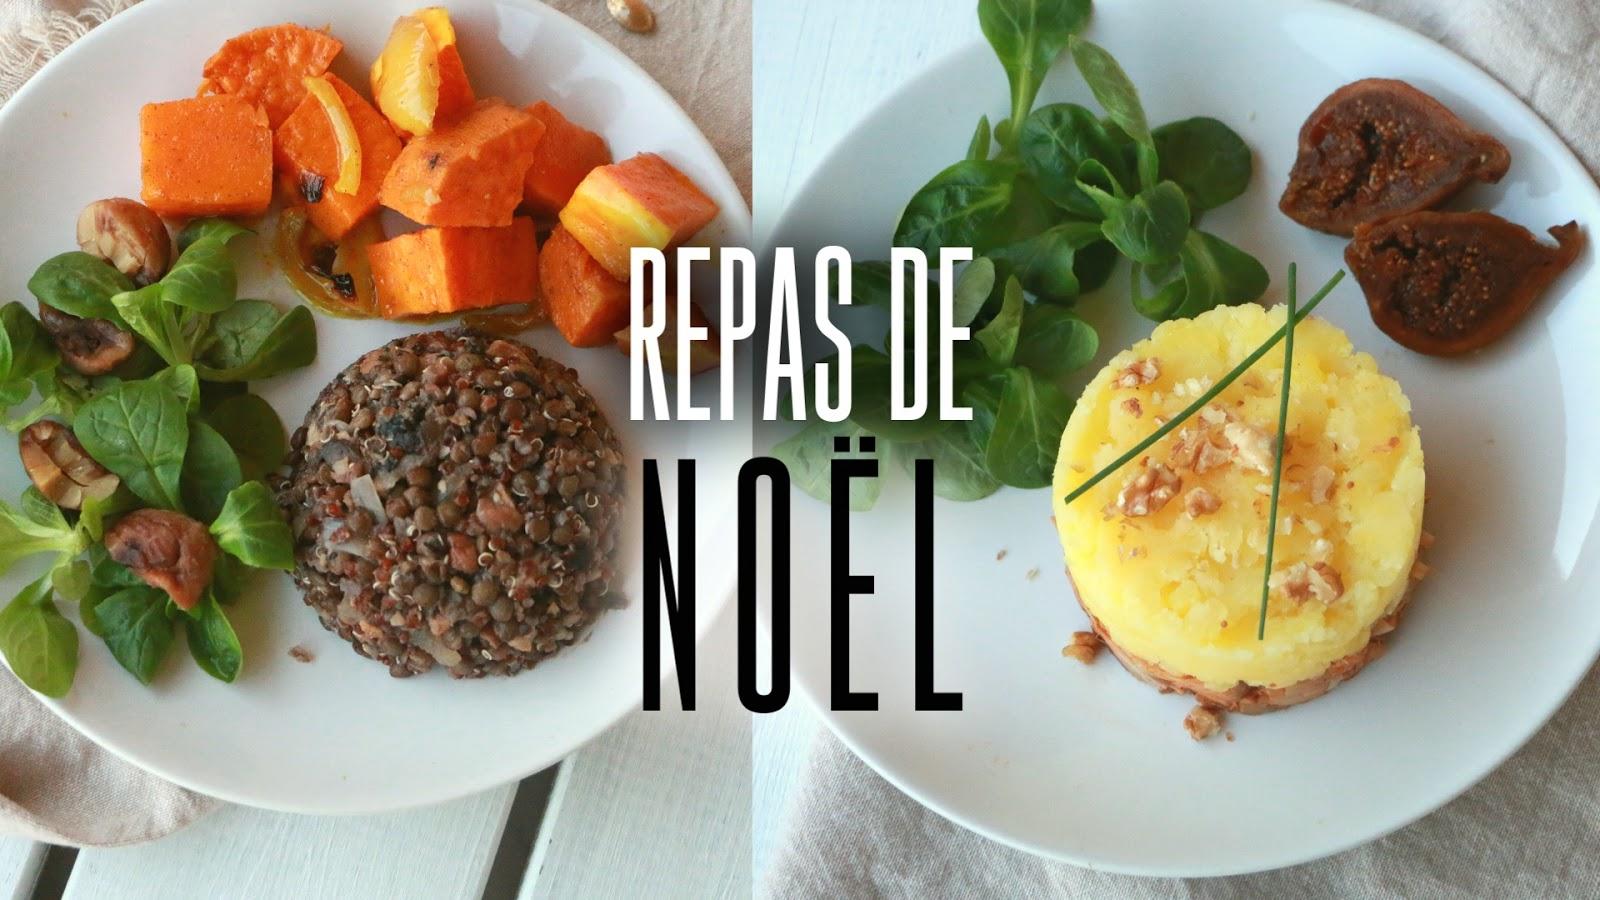 Recette repas noel vegan